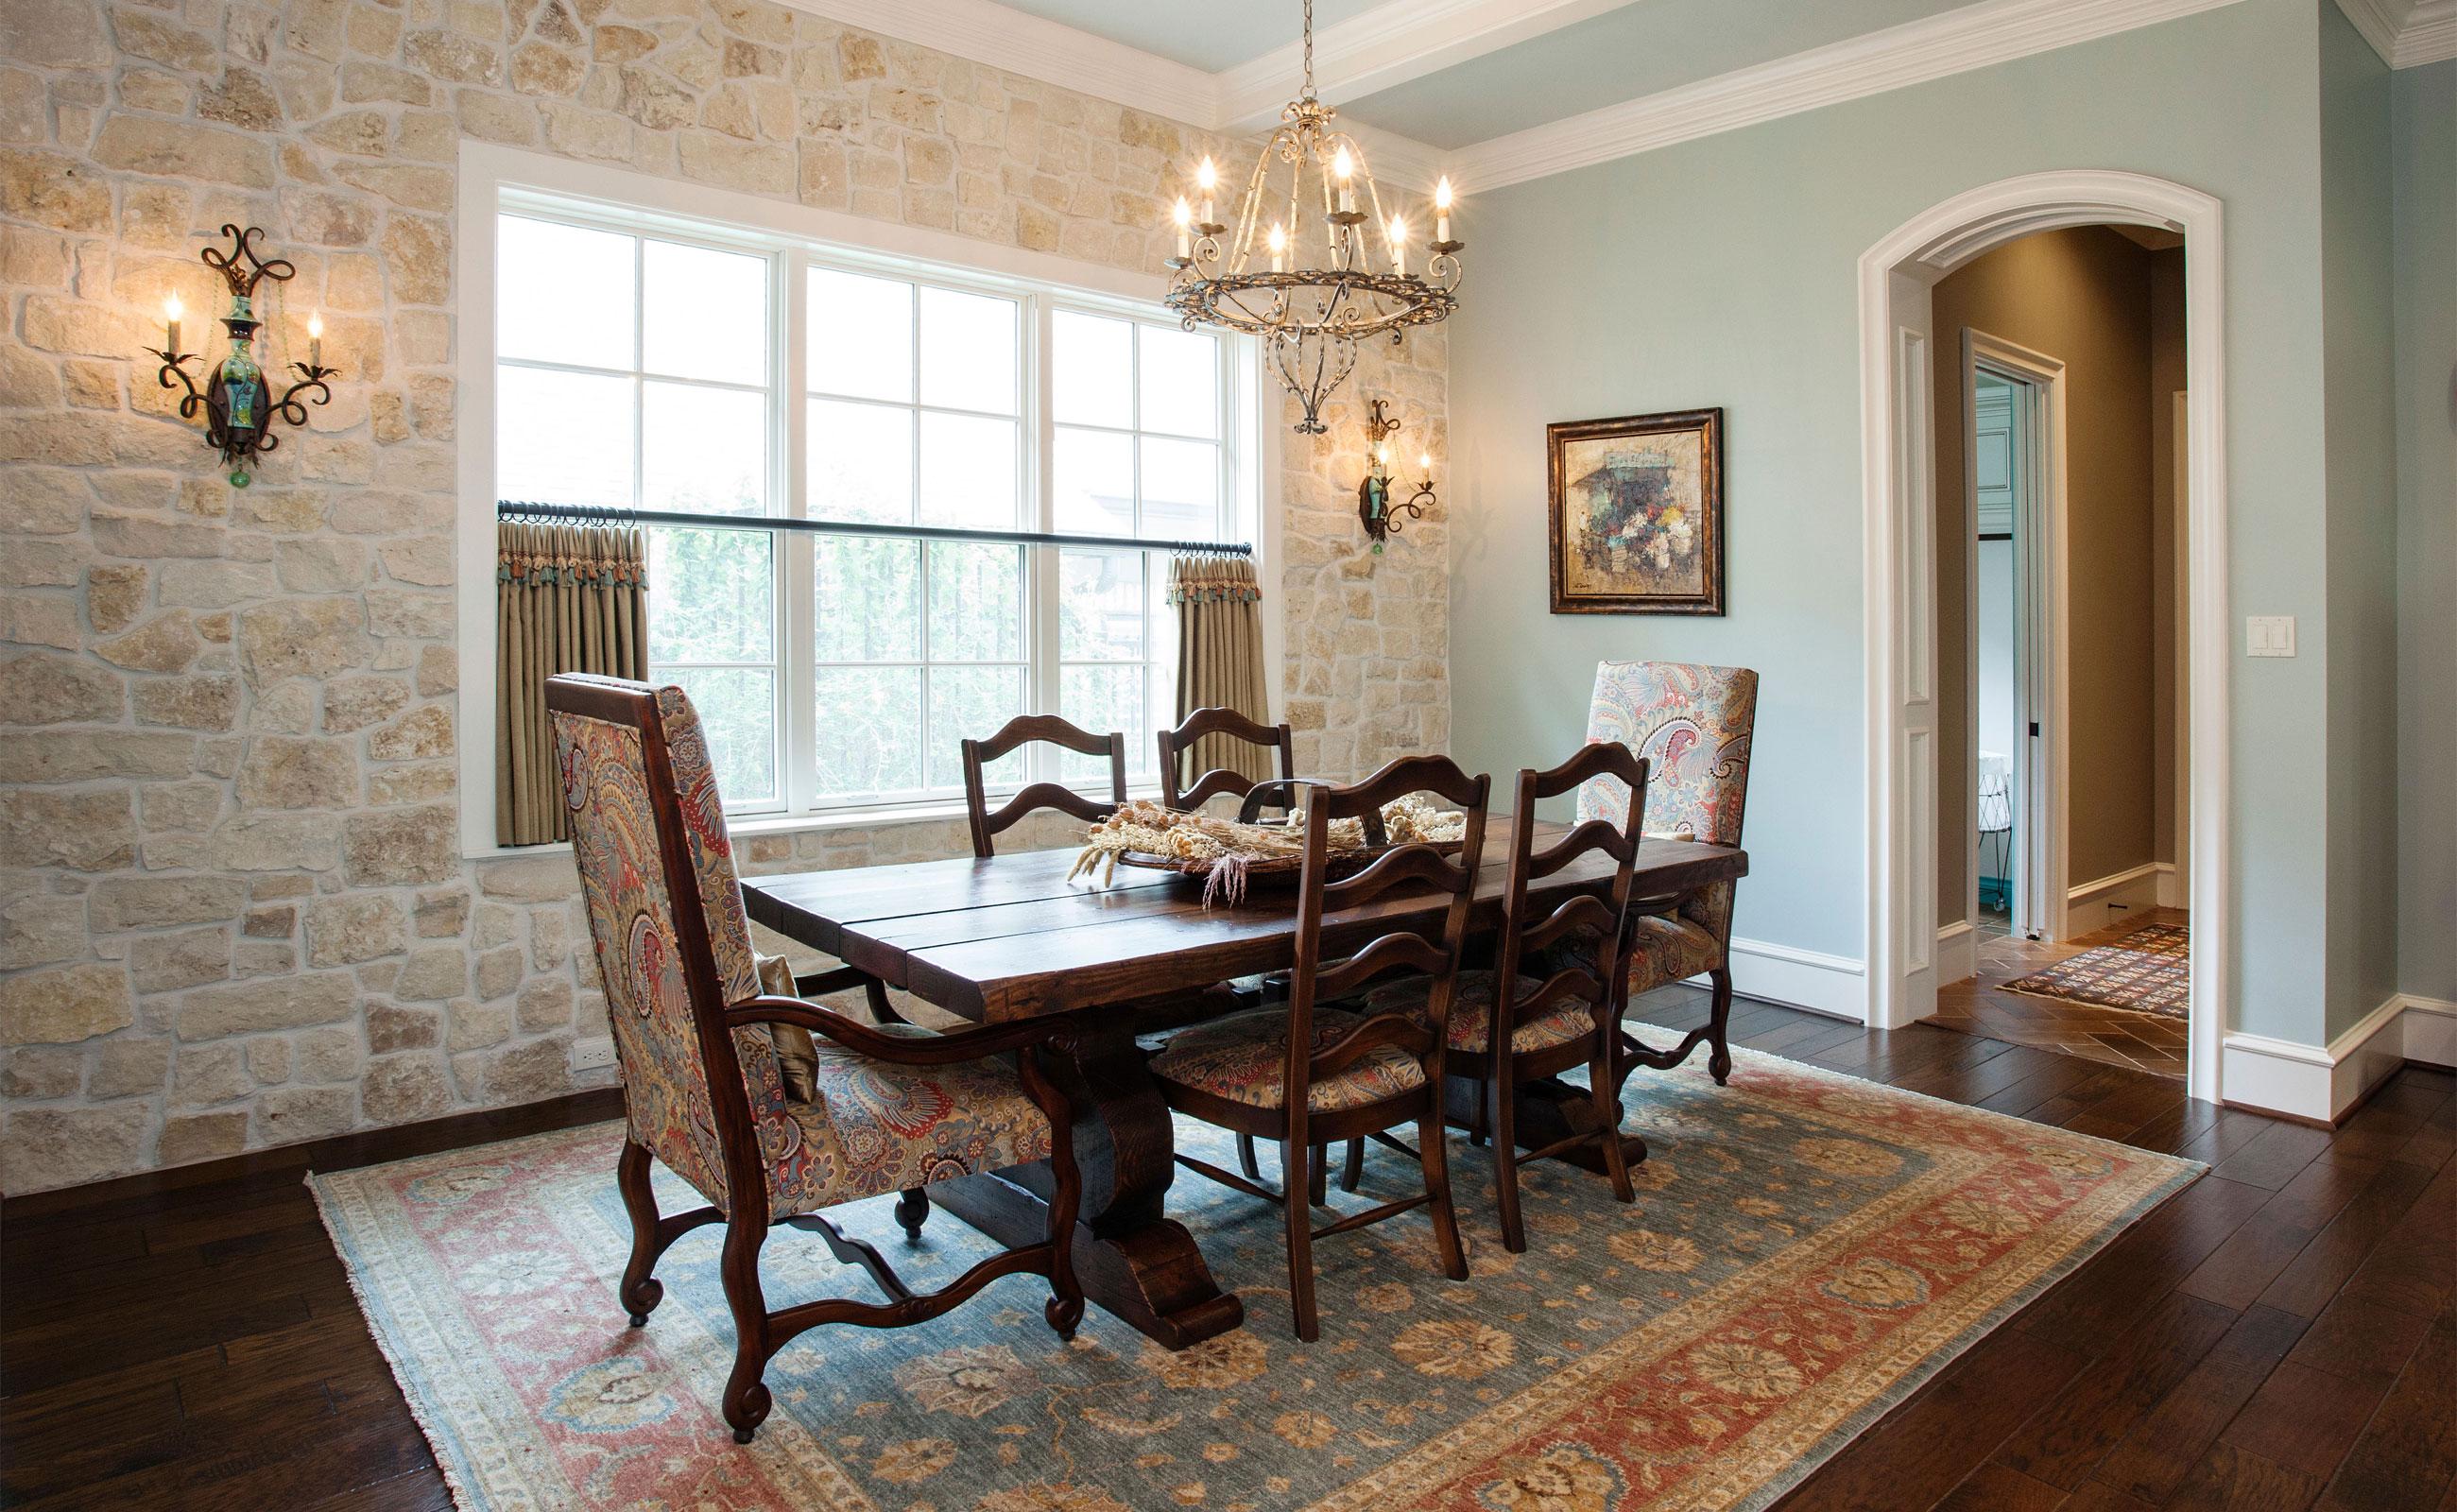 Ushak-Dining-Room-1600x2600